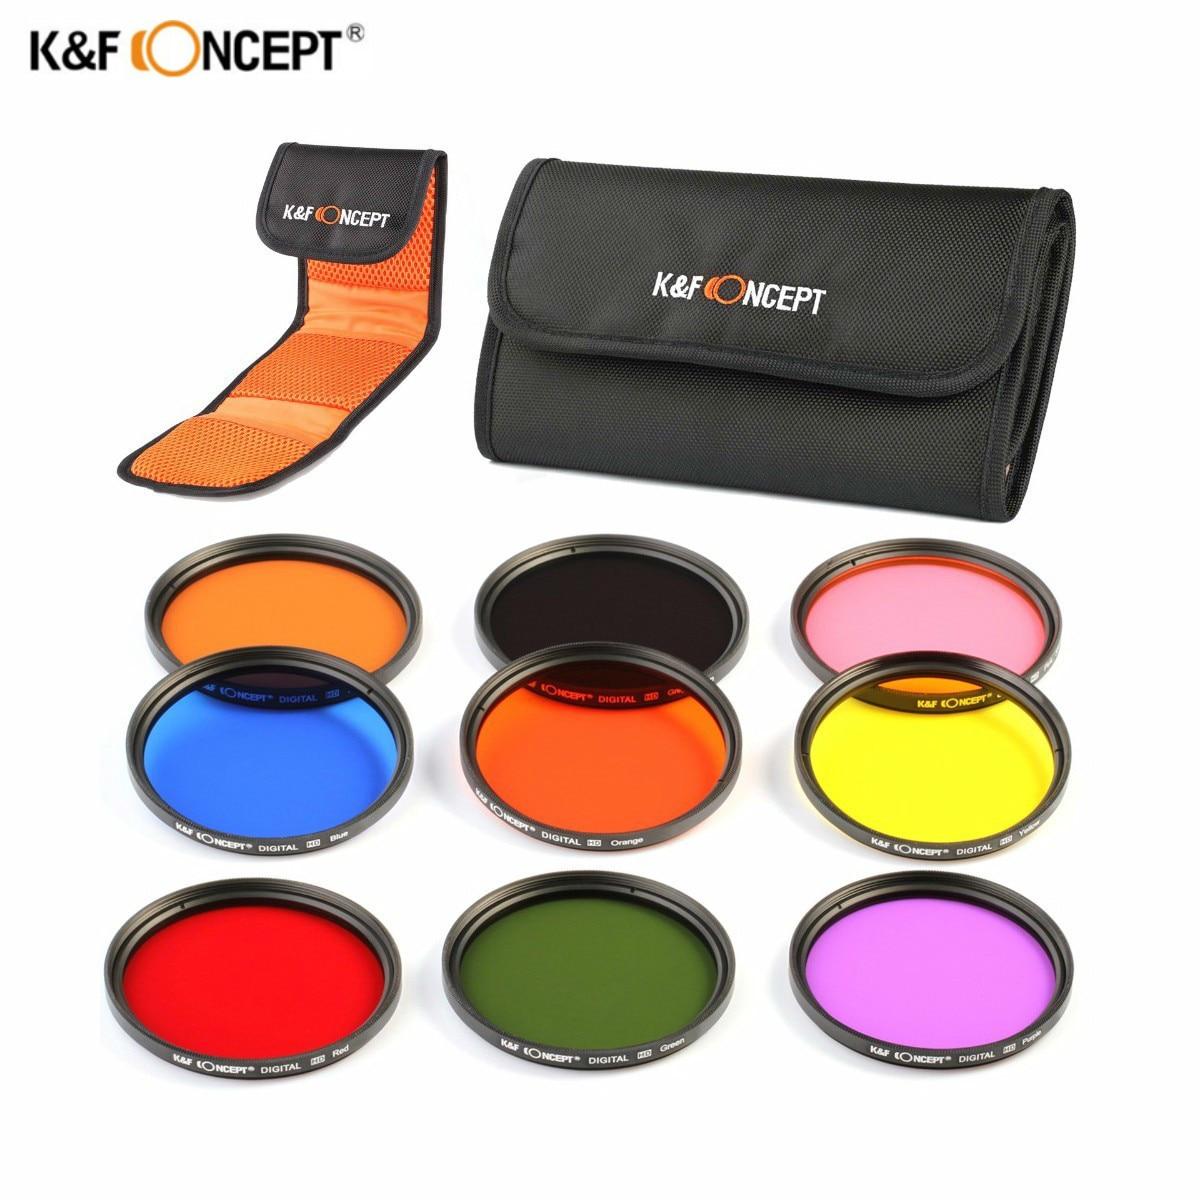 K&F Concept 9pcs 58mm Full Color ND Lens Filter Kit For Canon Rebel T4i T3i T2i T1i T3 For Nikon D7100 D5200 D3200 D310018-55mm